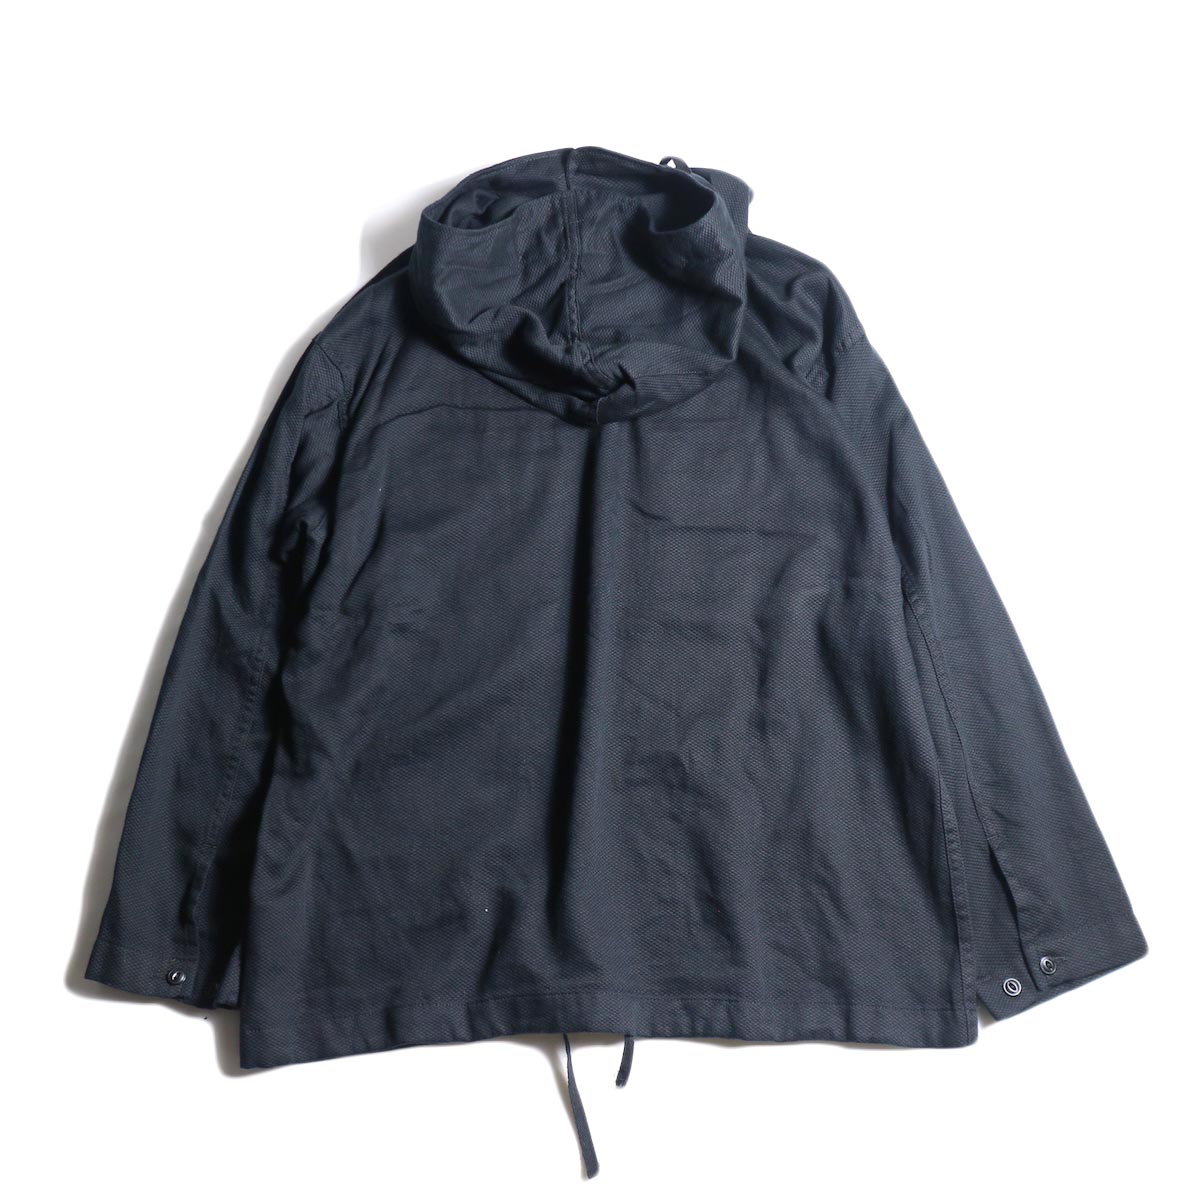 Engineered Garments / Cagoule Shirt -Waffle Pique (Black)背面